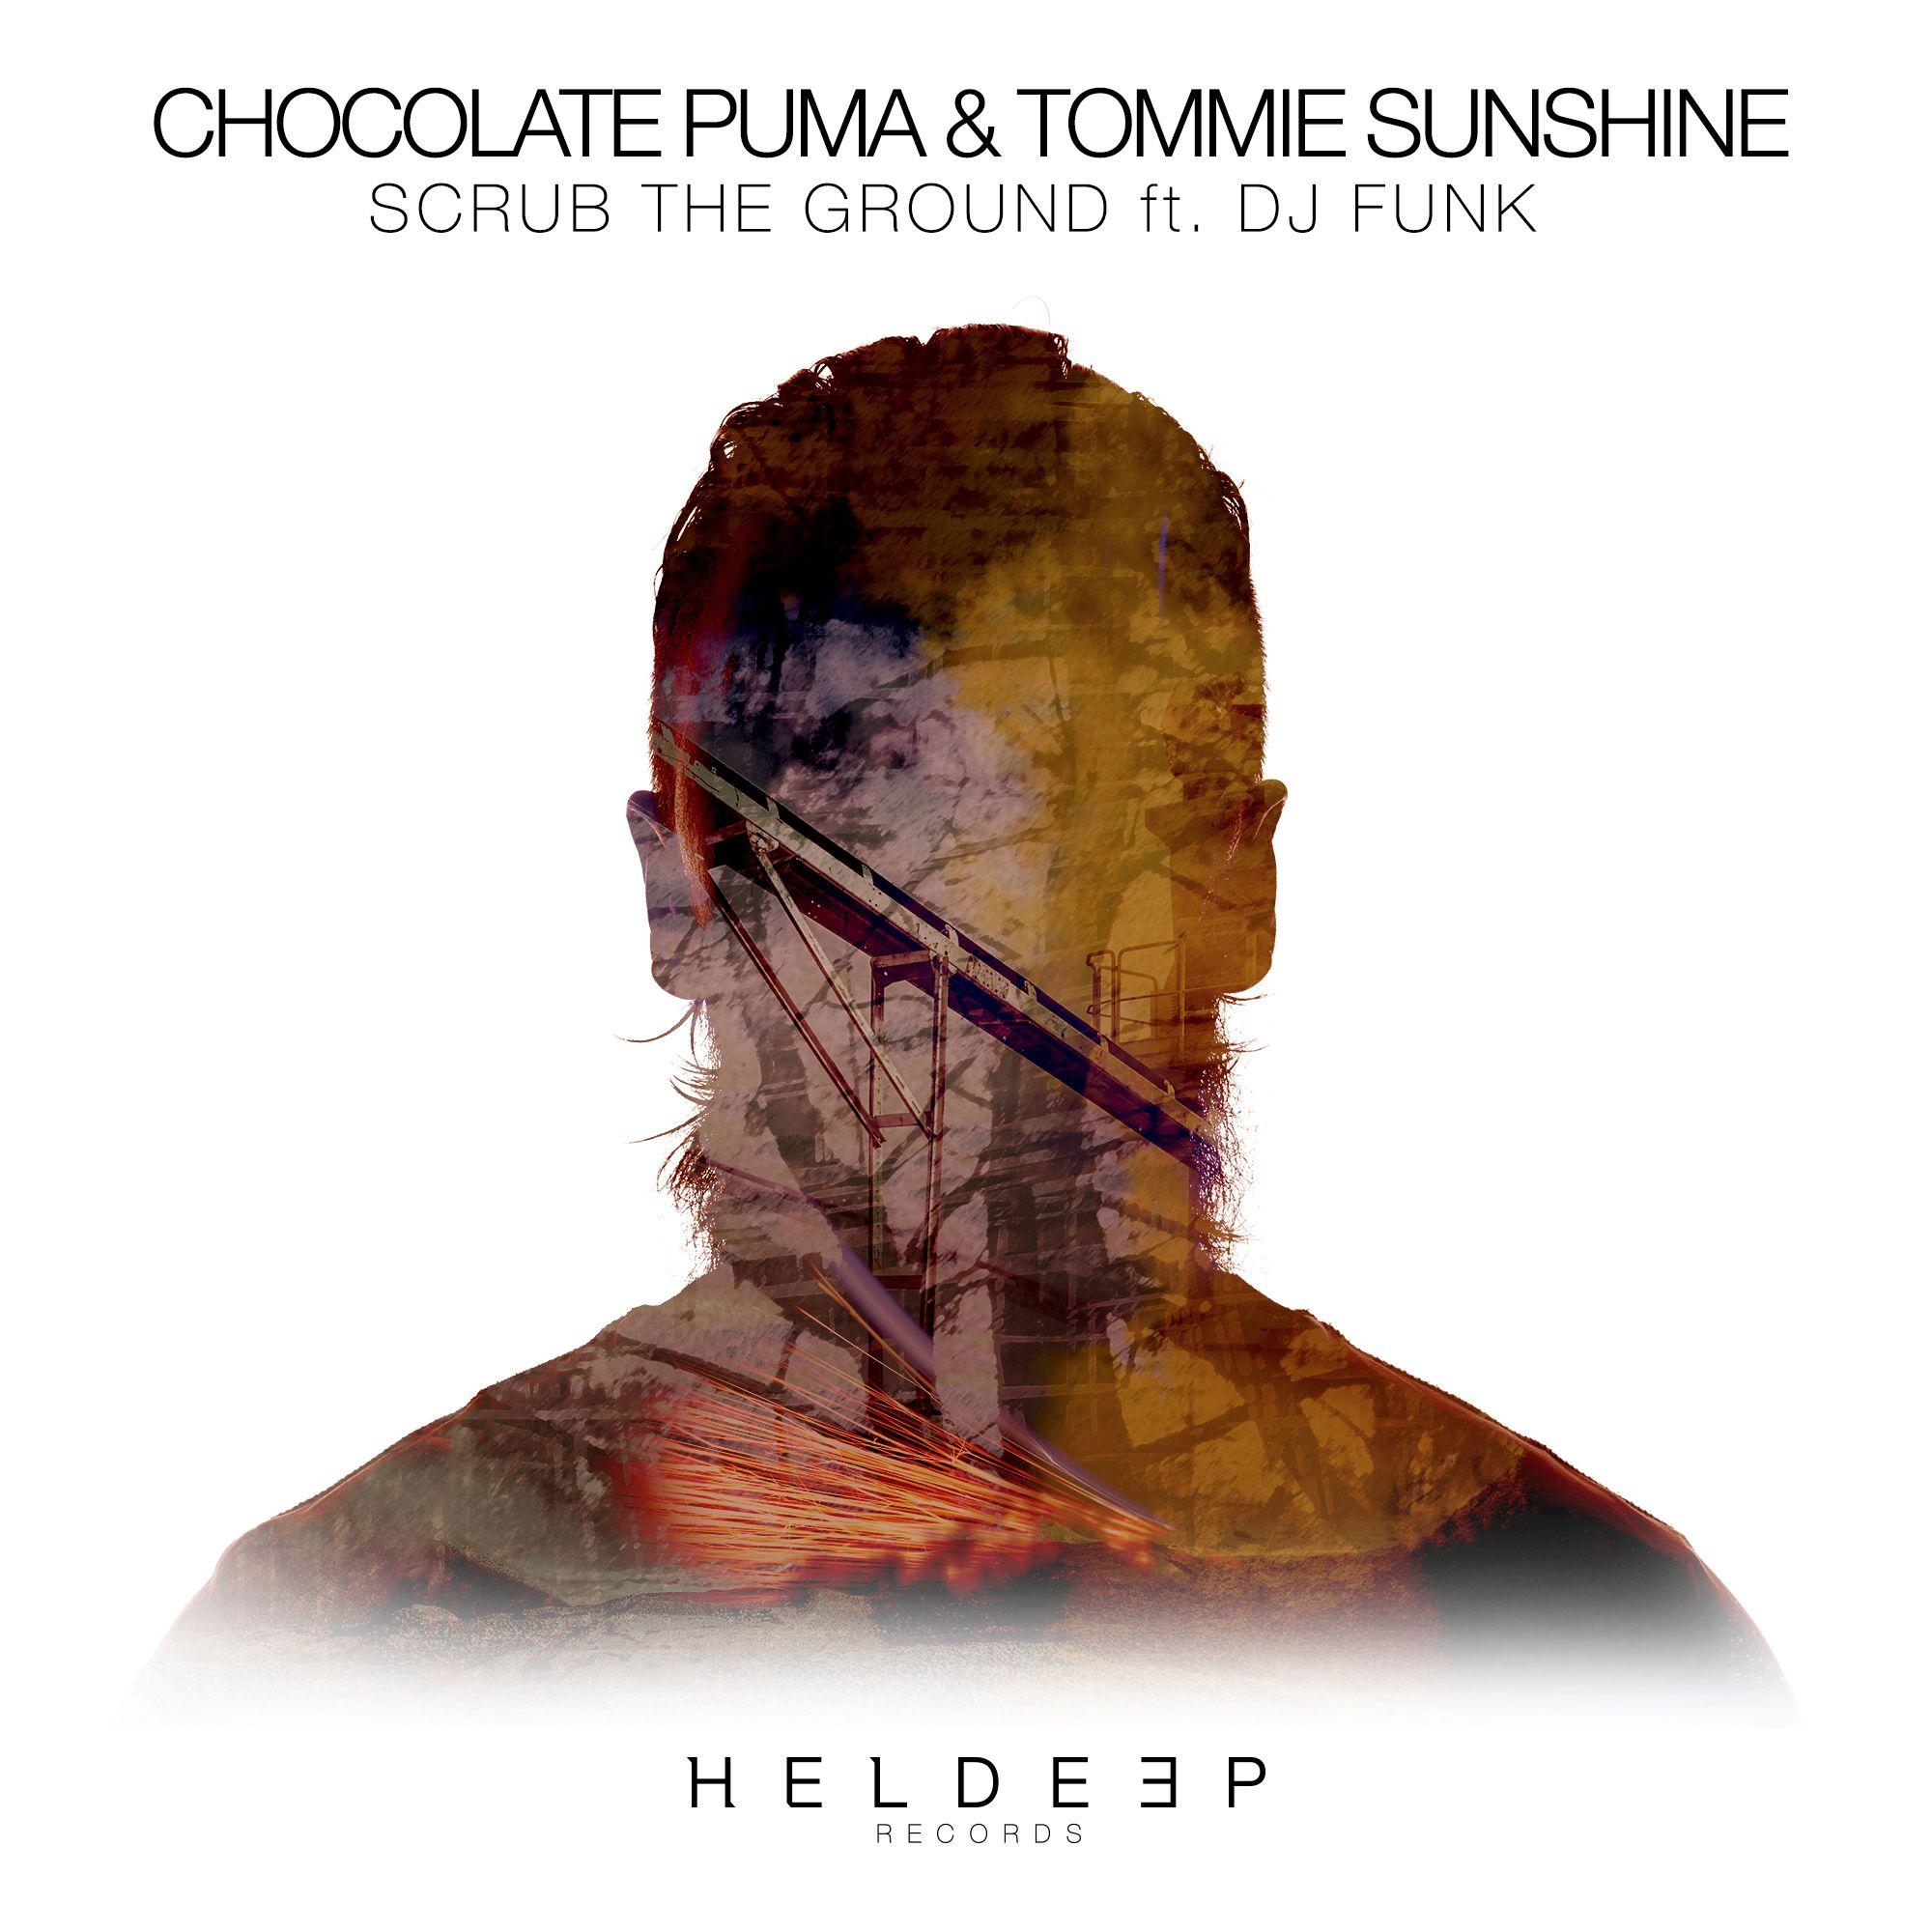 Chocolate Puma & Tommie Sunshine Feat. DJ Funk - Scrub The Ground (Radio Edit)